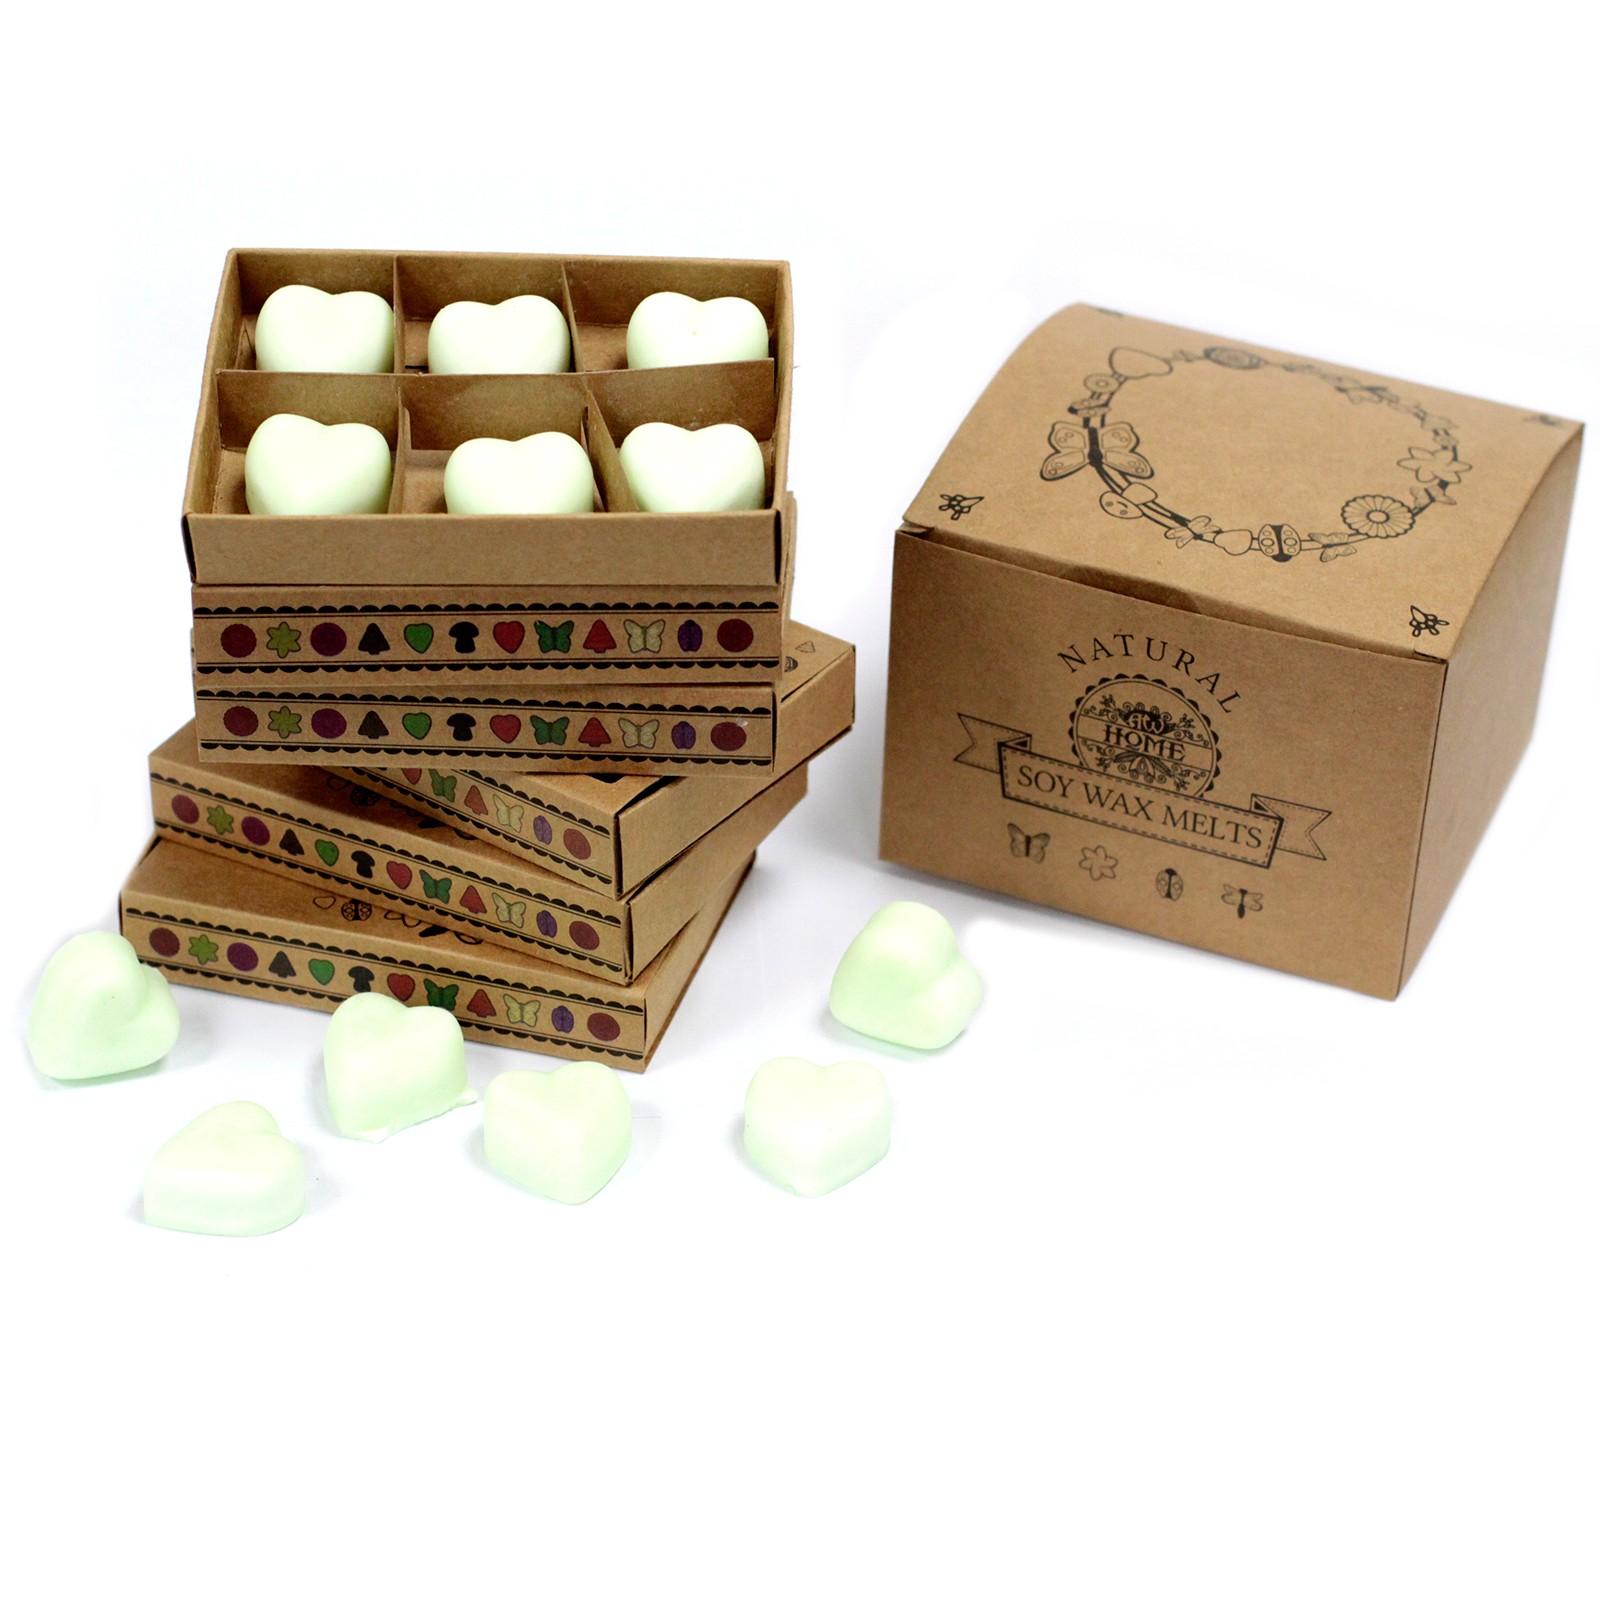 Box of 6 Wax Melts Apple Spice